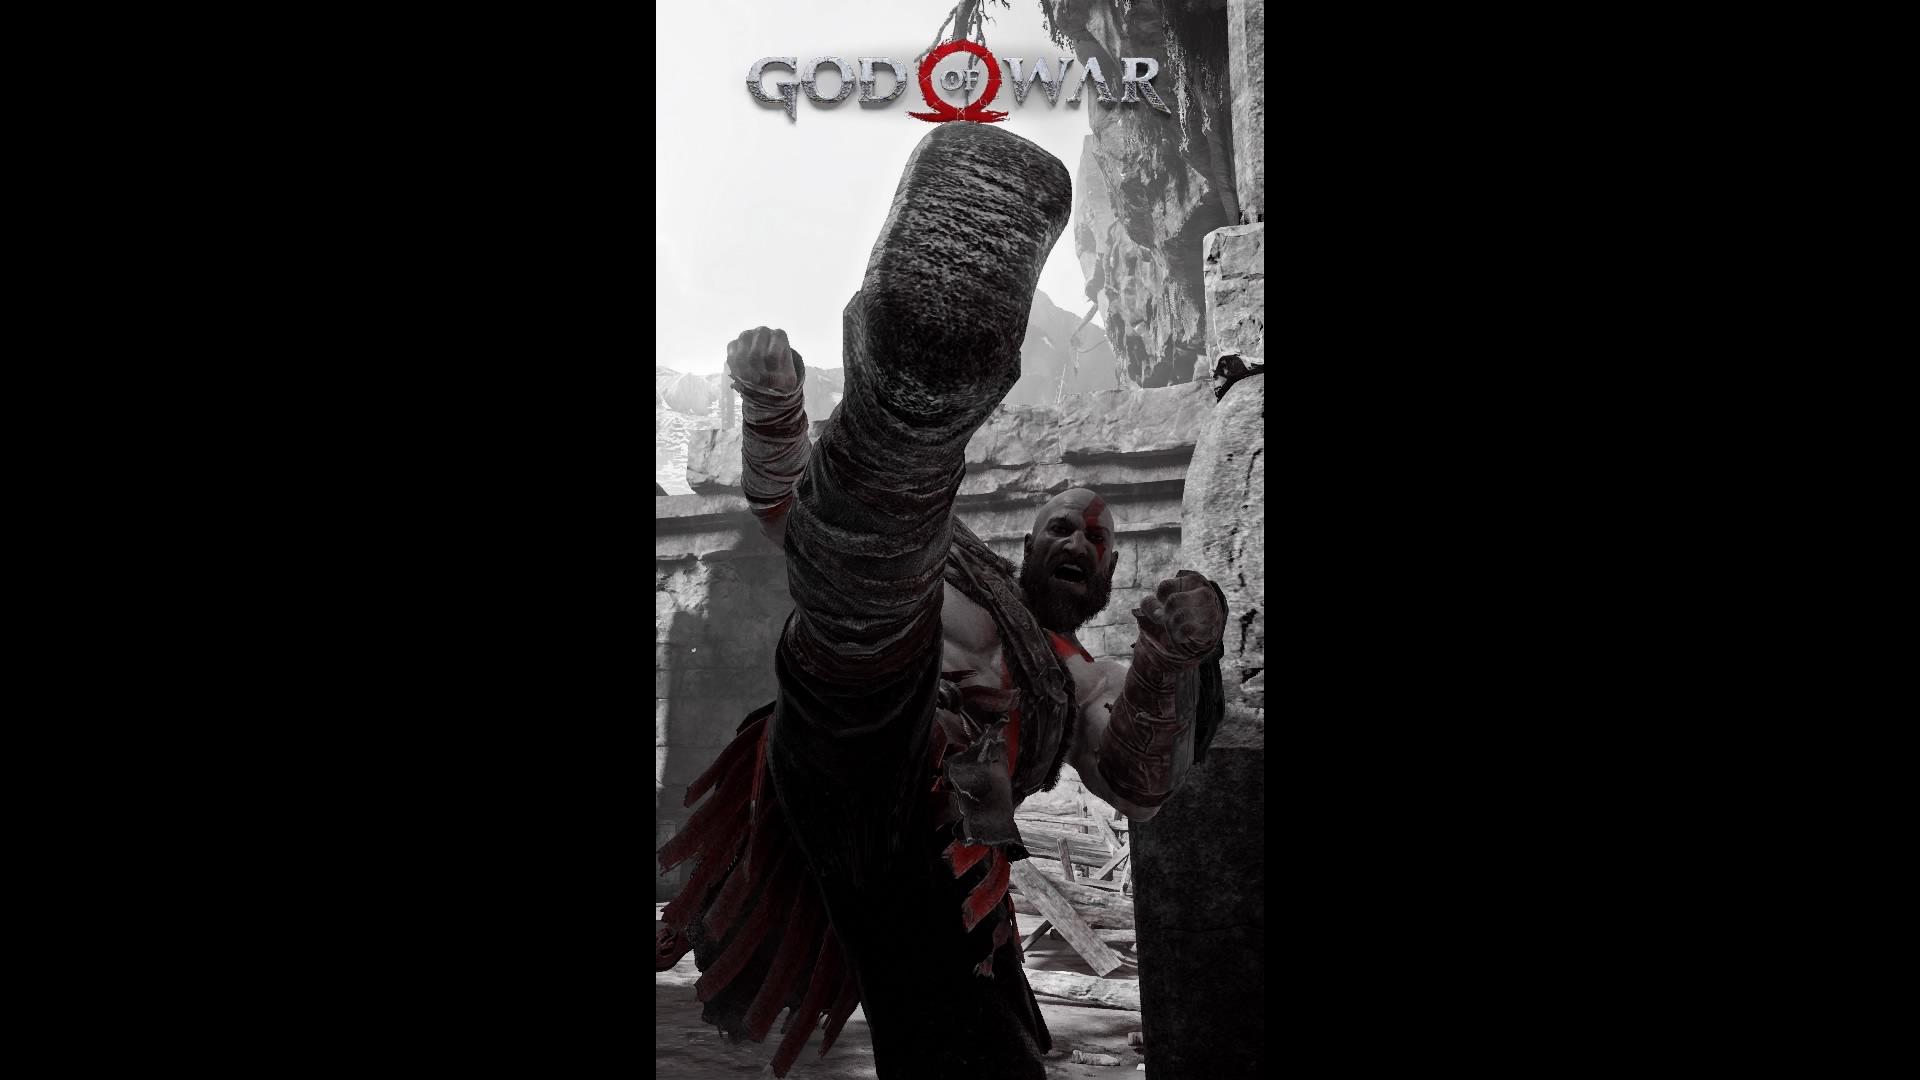 God of War_20180513103834.jpg - God of War (2018)